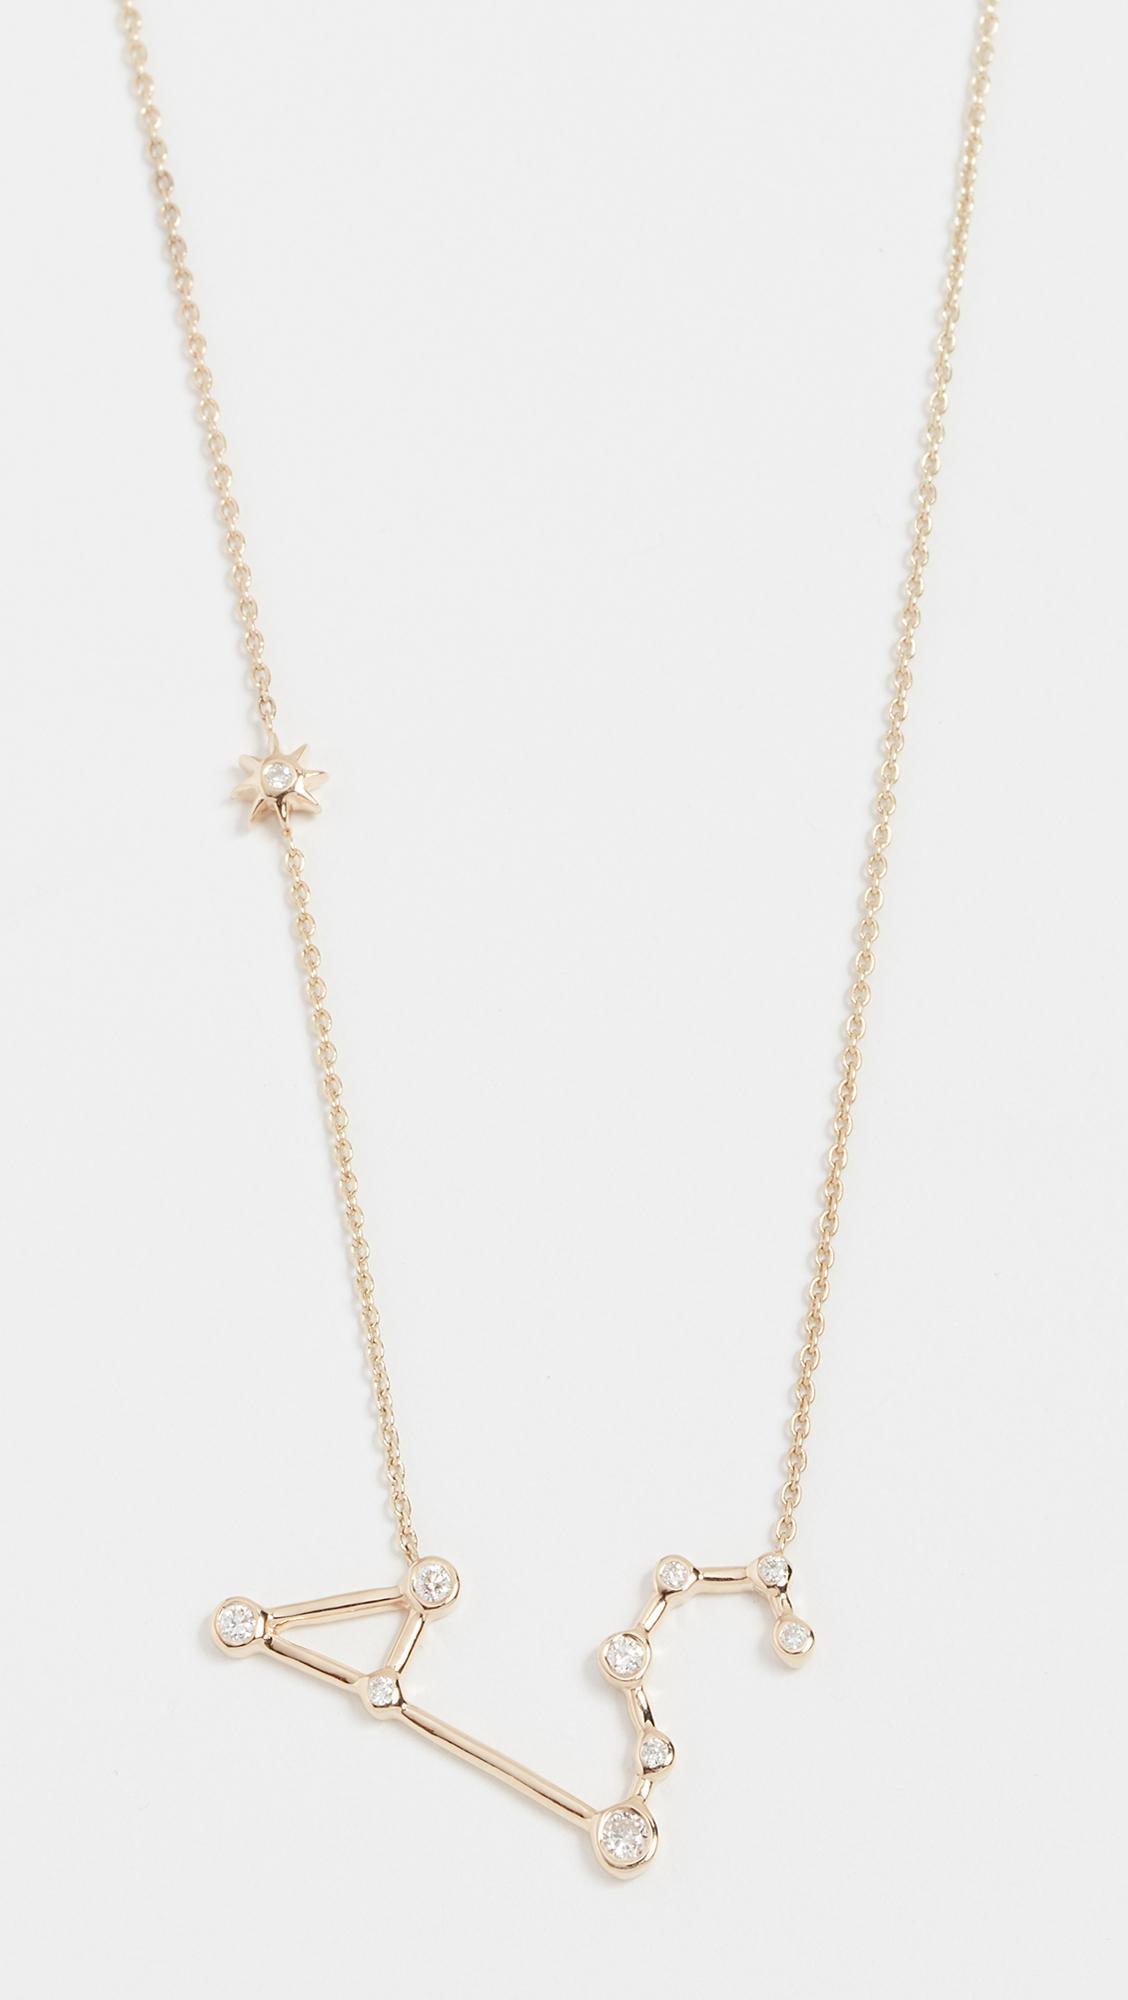 Lulu Frost 14k Gold Leo Necklace with White Diamonds zOCjL